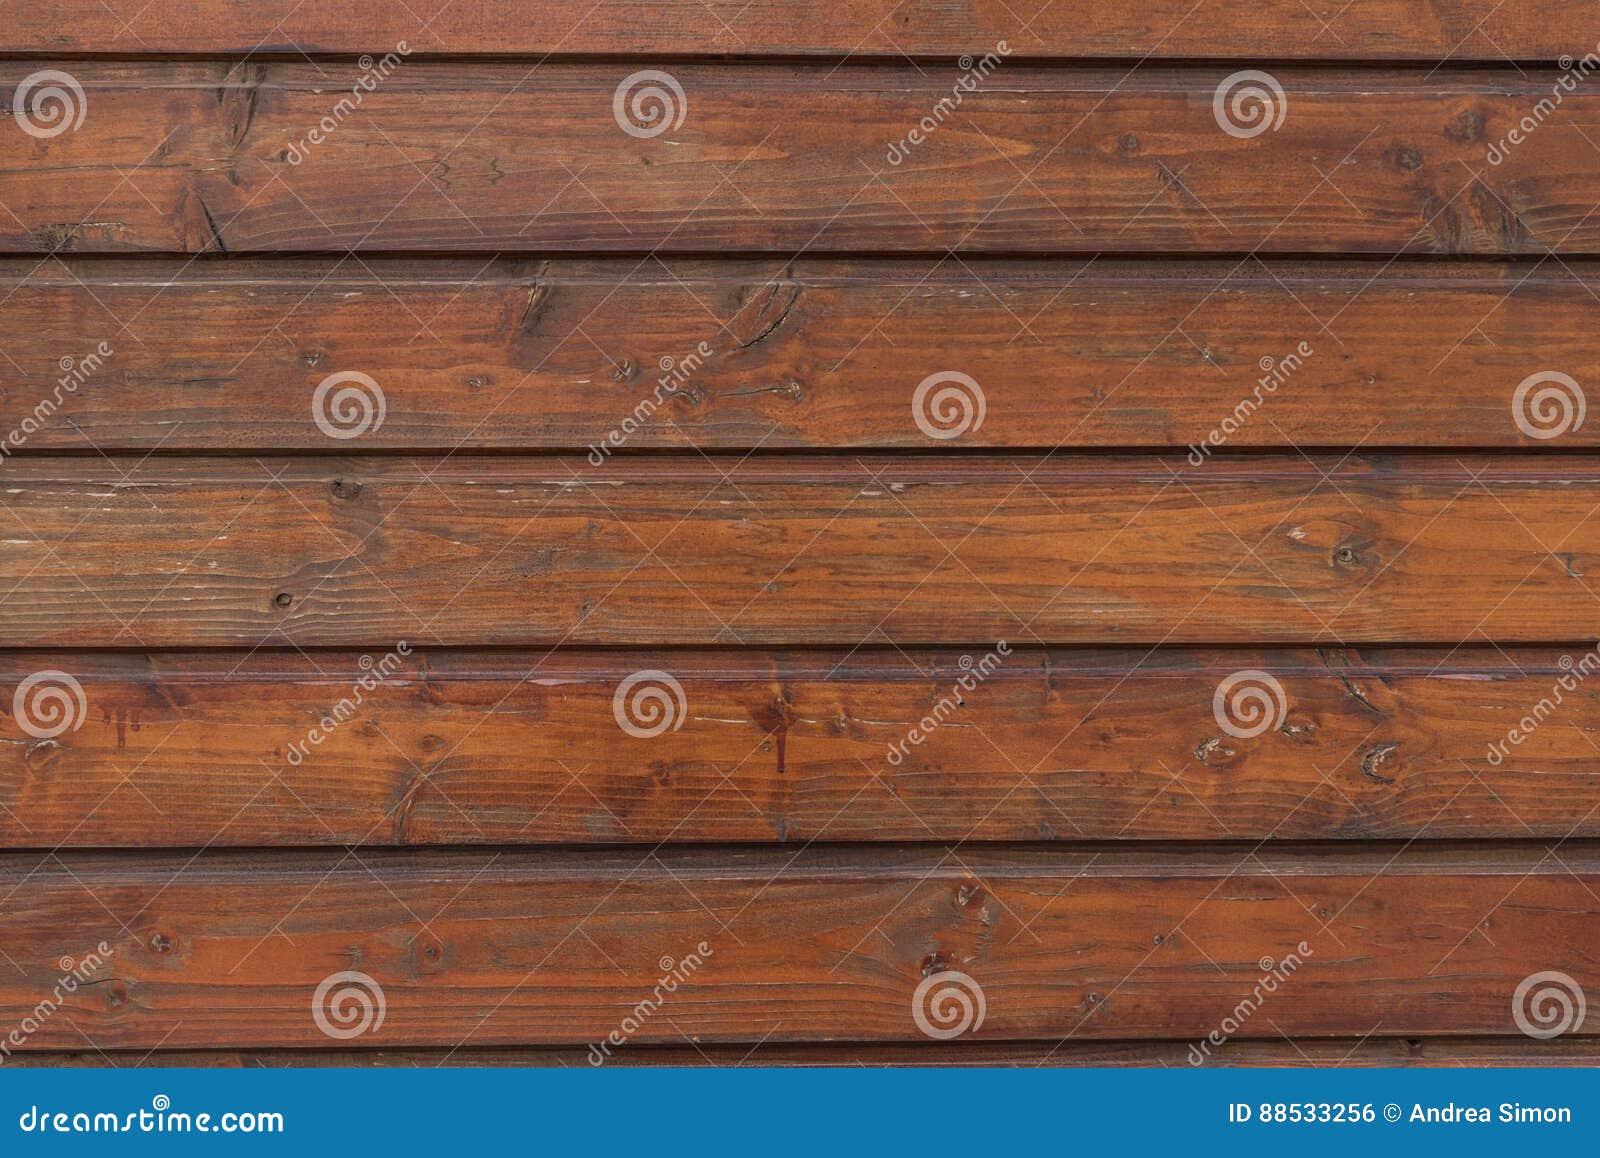 Download 木纹理板条五谷背景、木书桌桌或者地板 库存照片. 图片 包括有 设计, 模式, 桌面, 谷物, 自然, 楼层 - 88533256